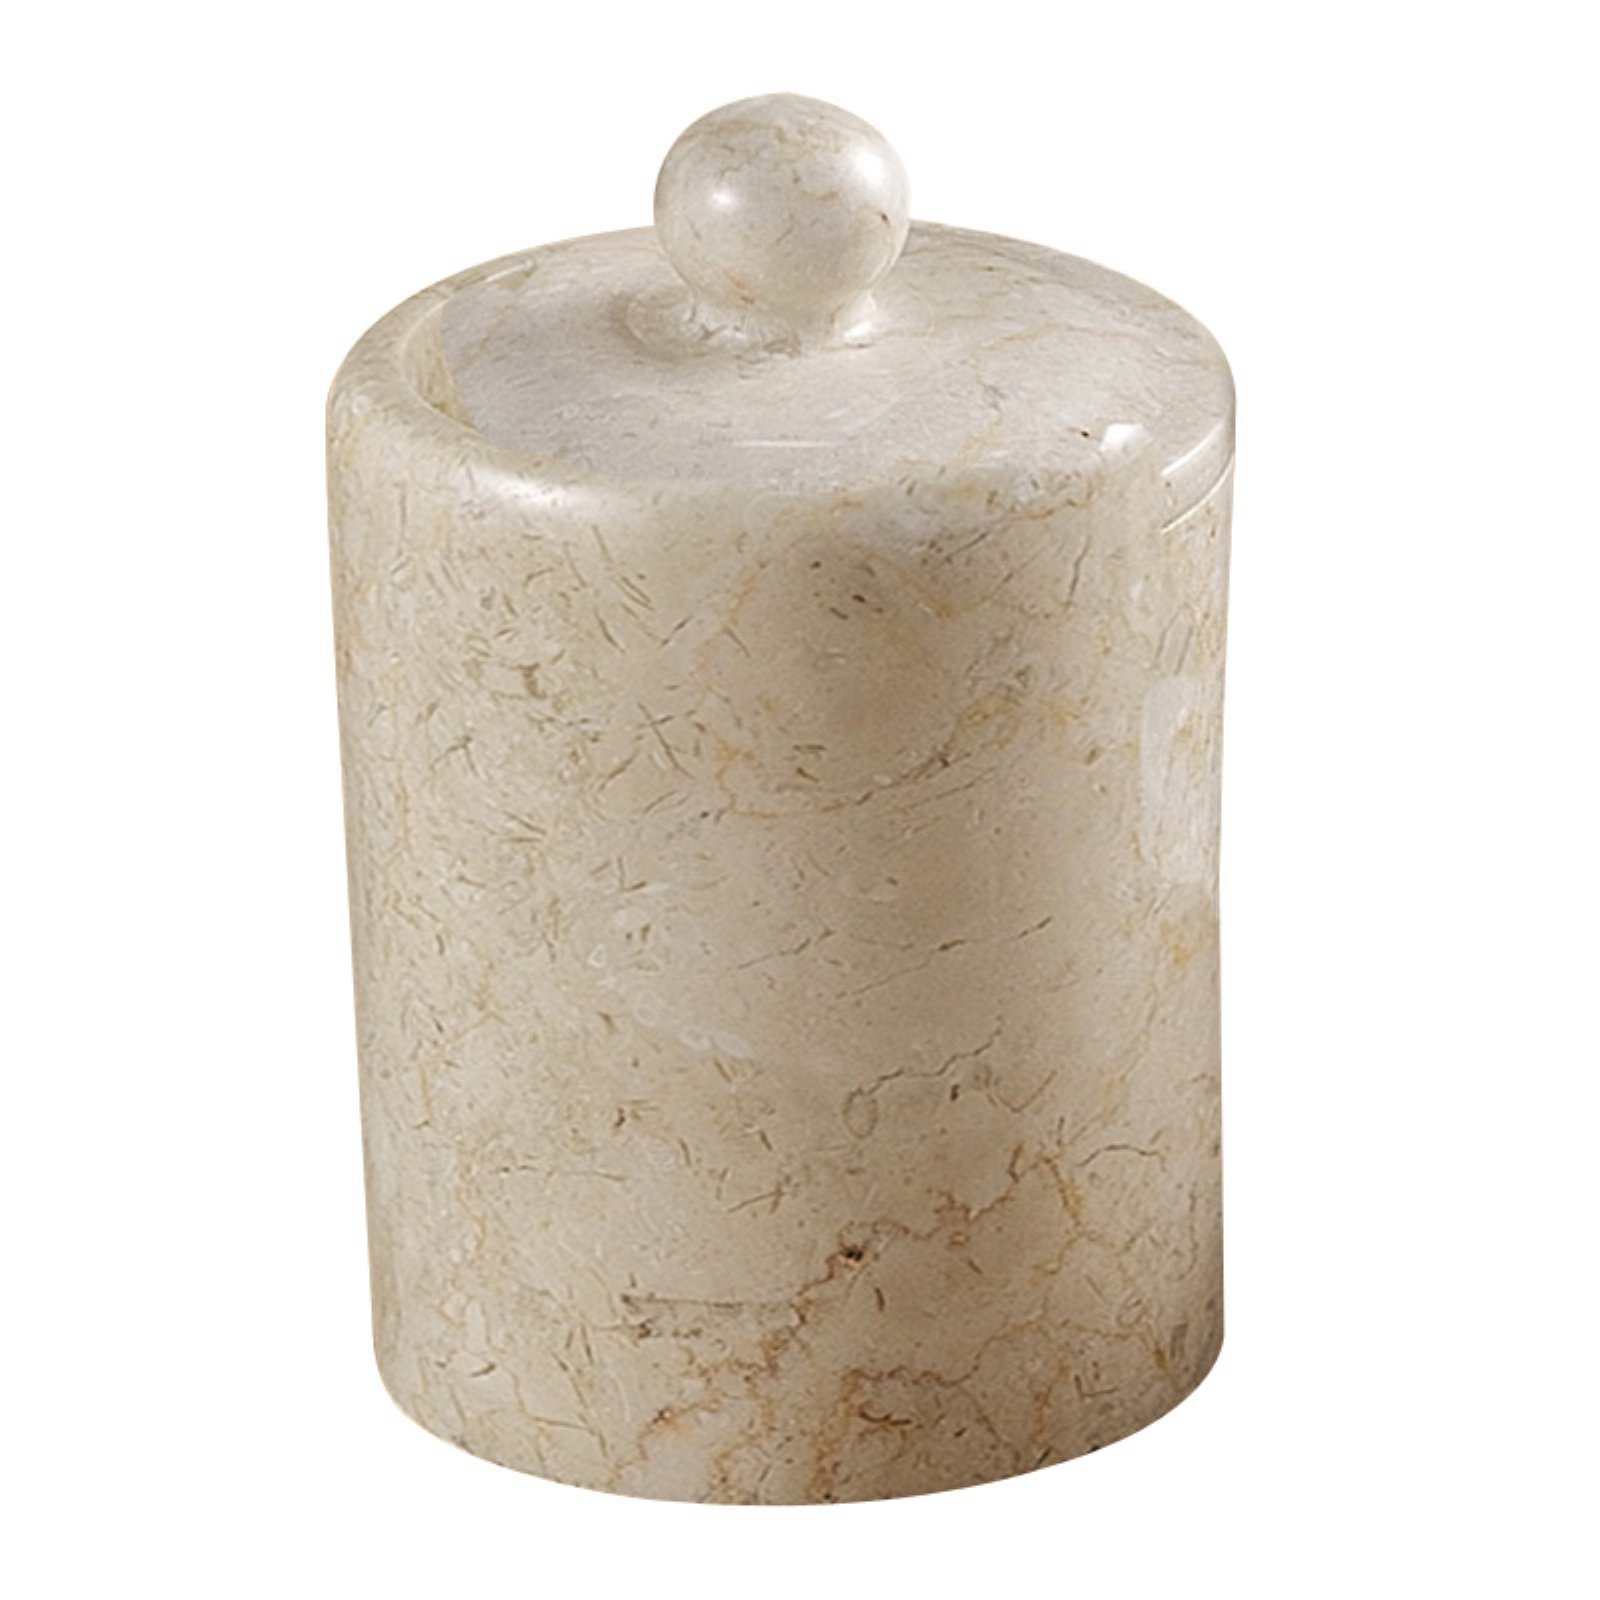 Creative Home Spa Marble Cotton Ball Holder